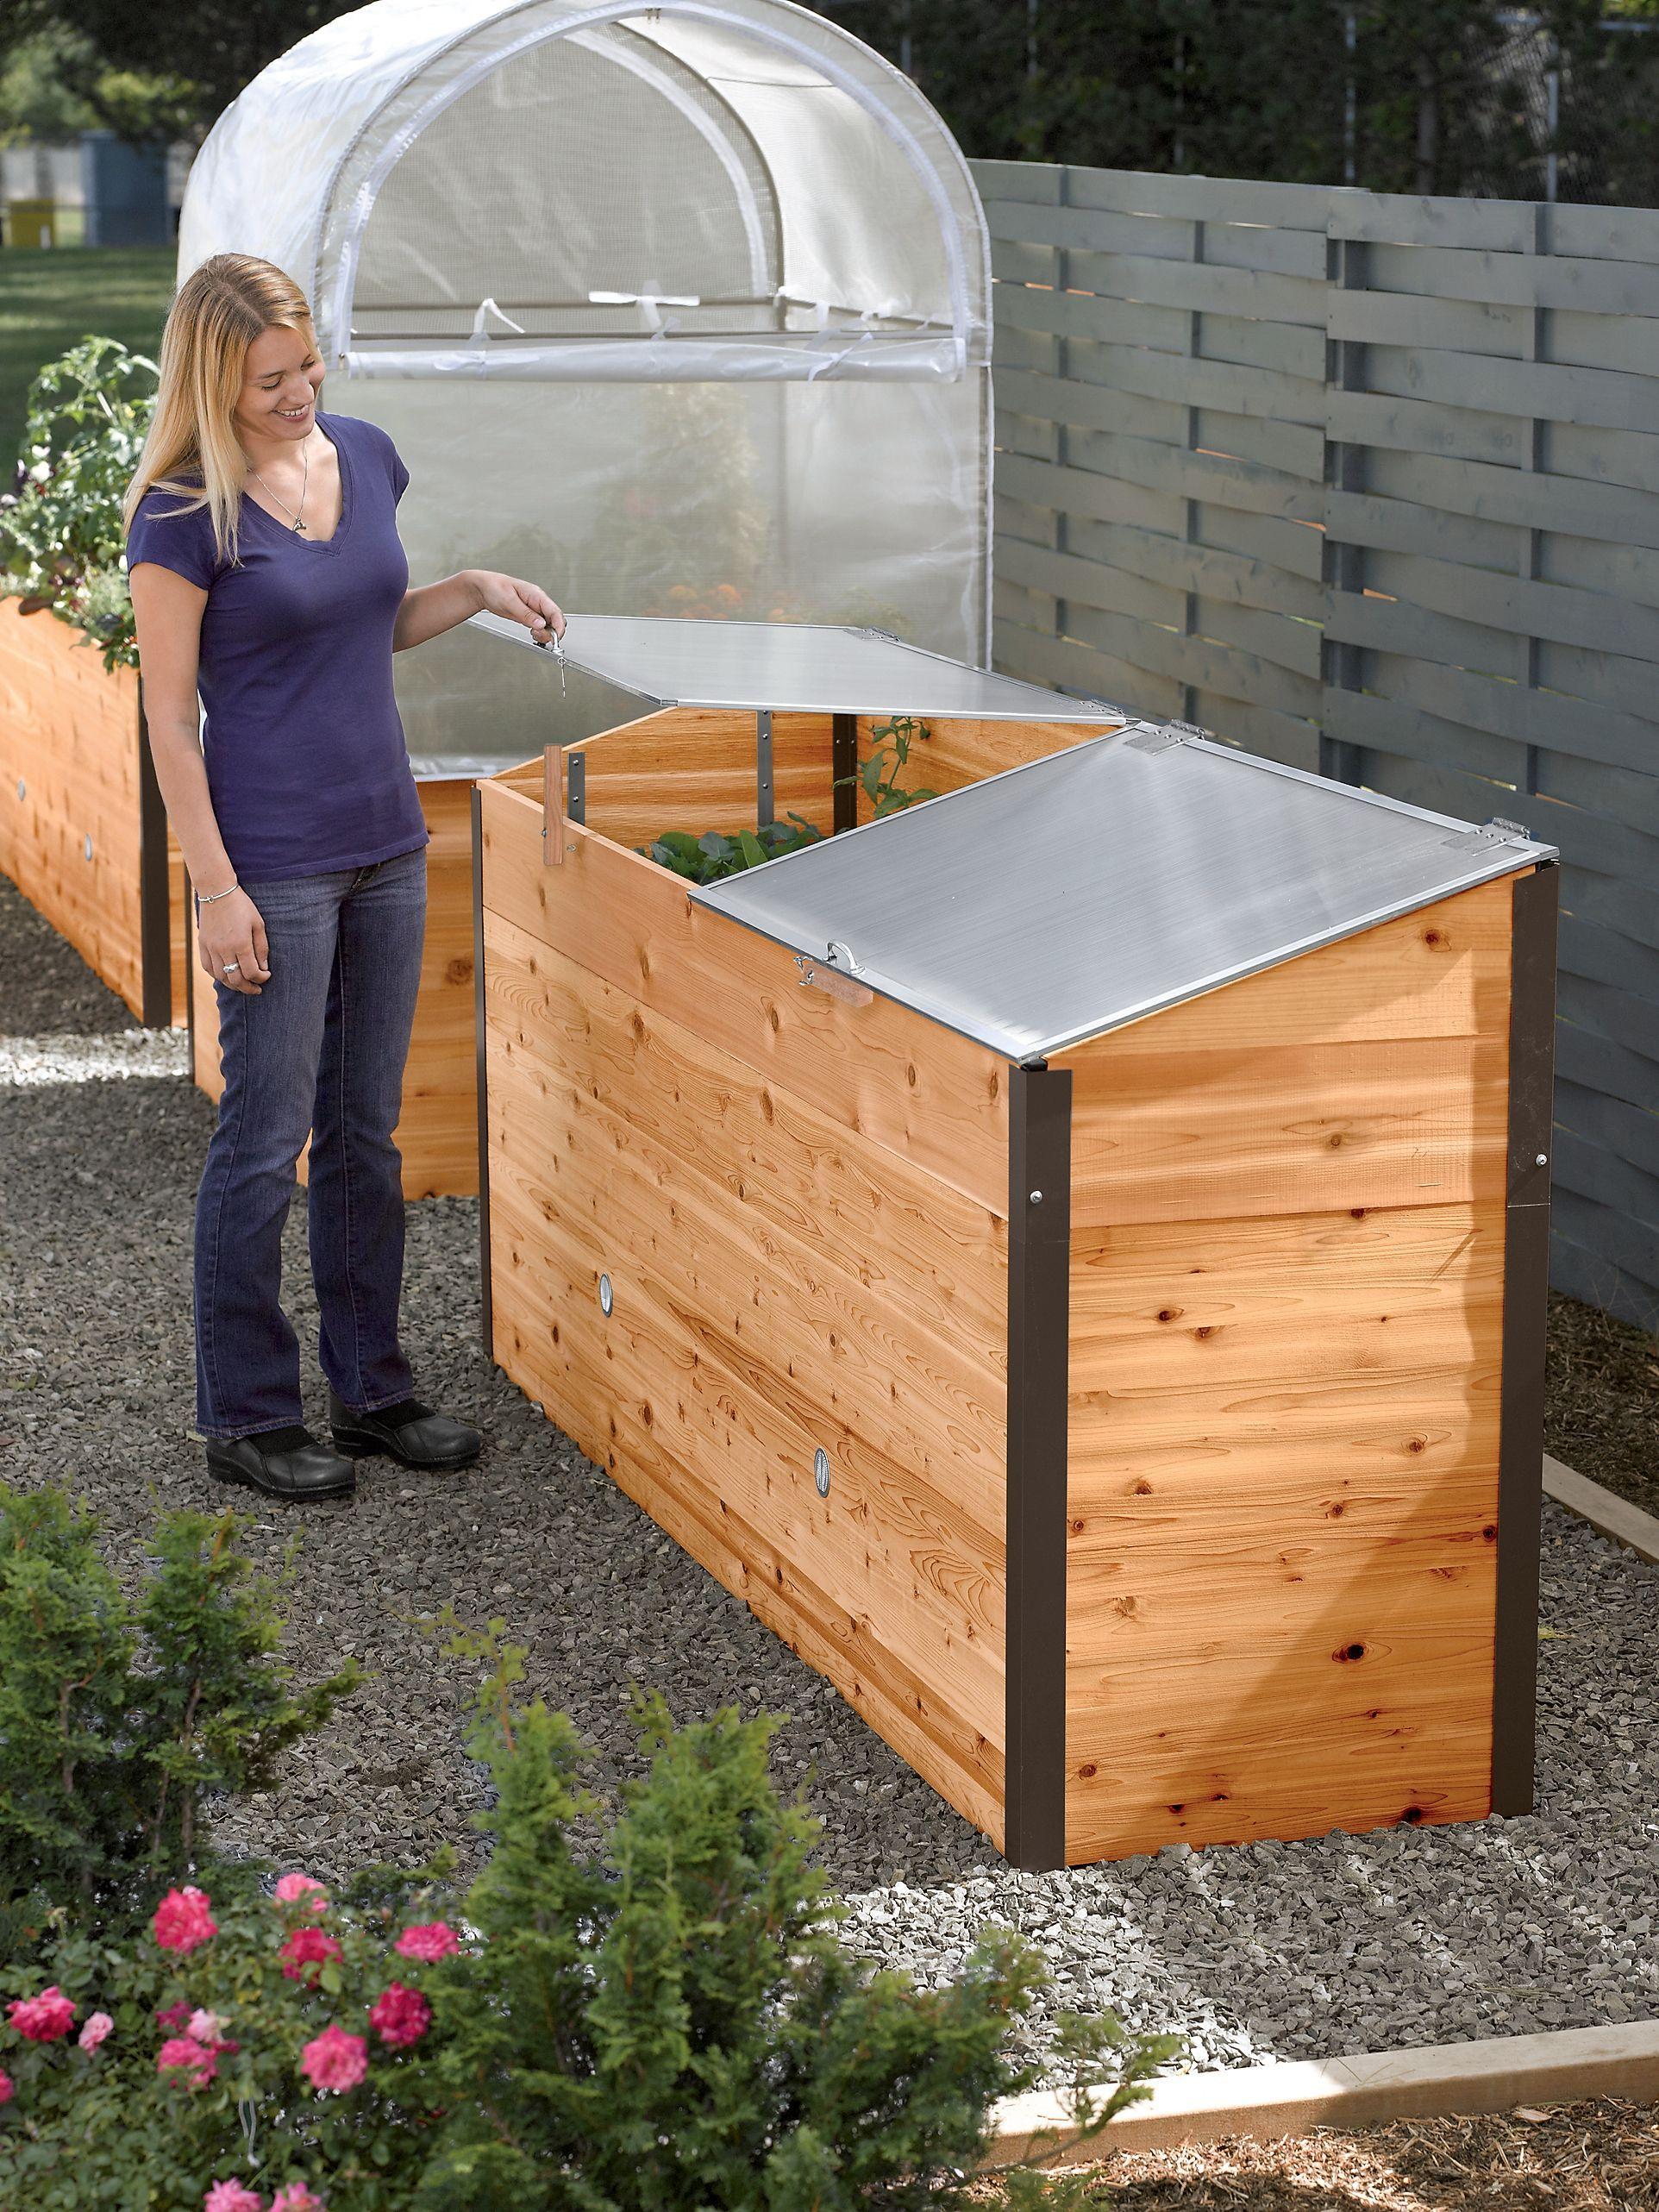 Transformation Palette En Jardiniere built-in planter designs can easily transform your outdoor